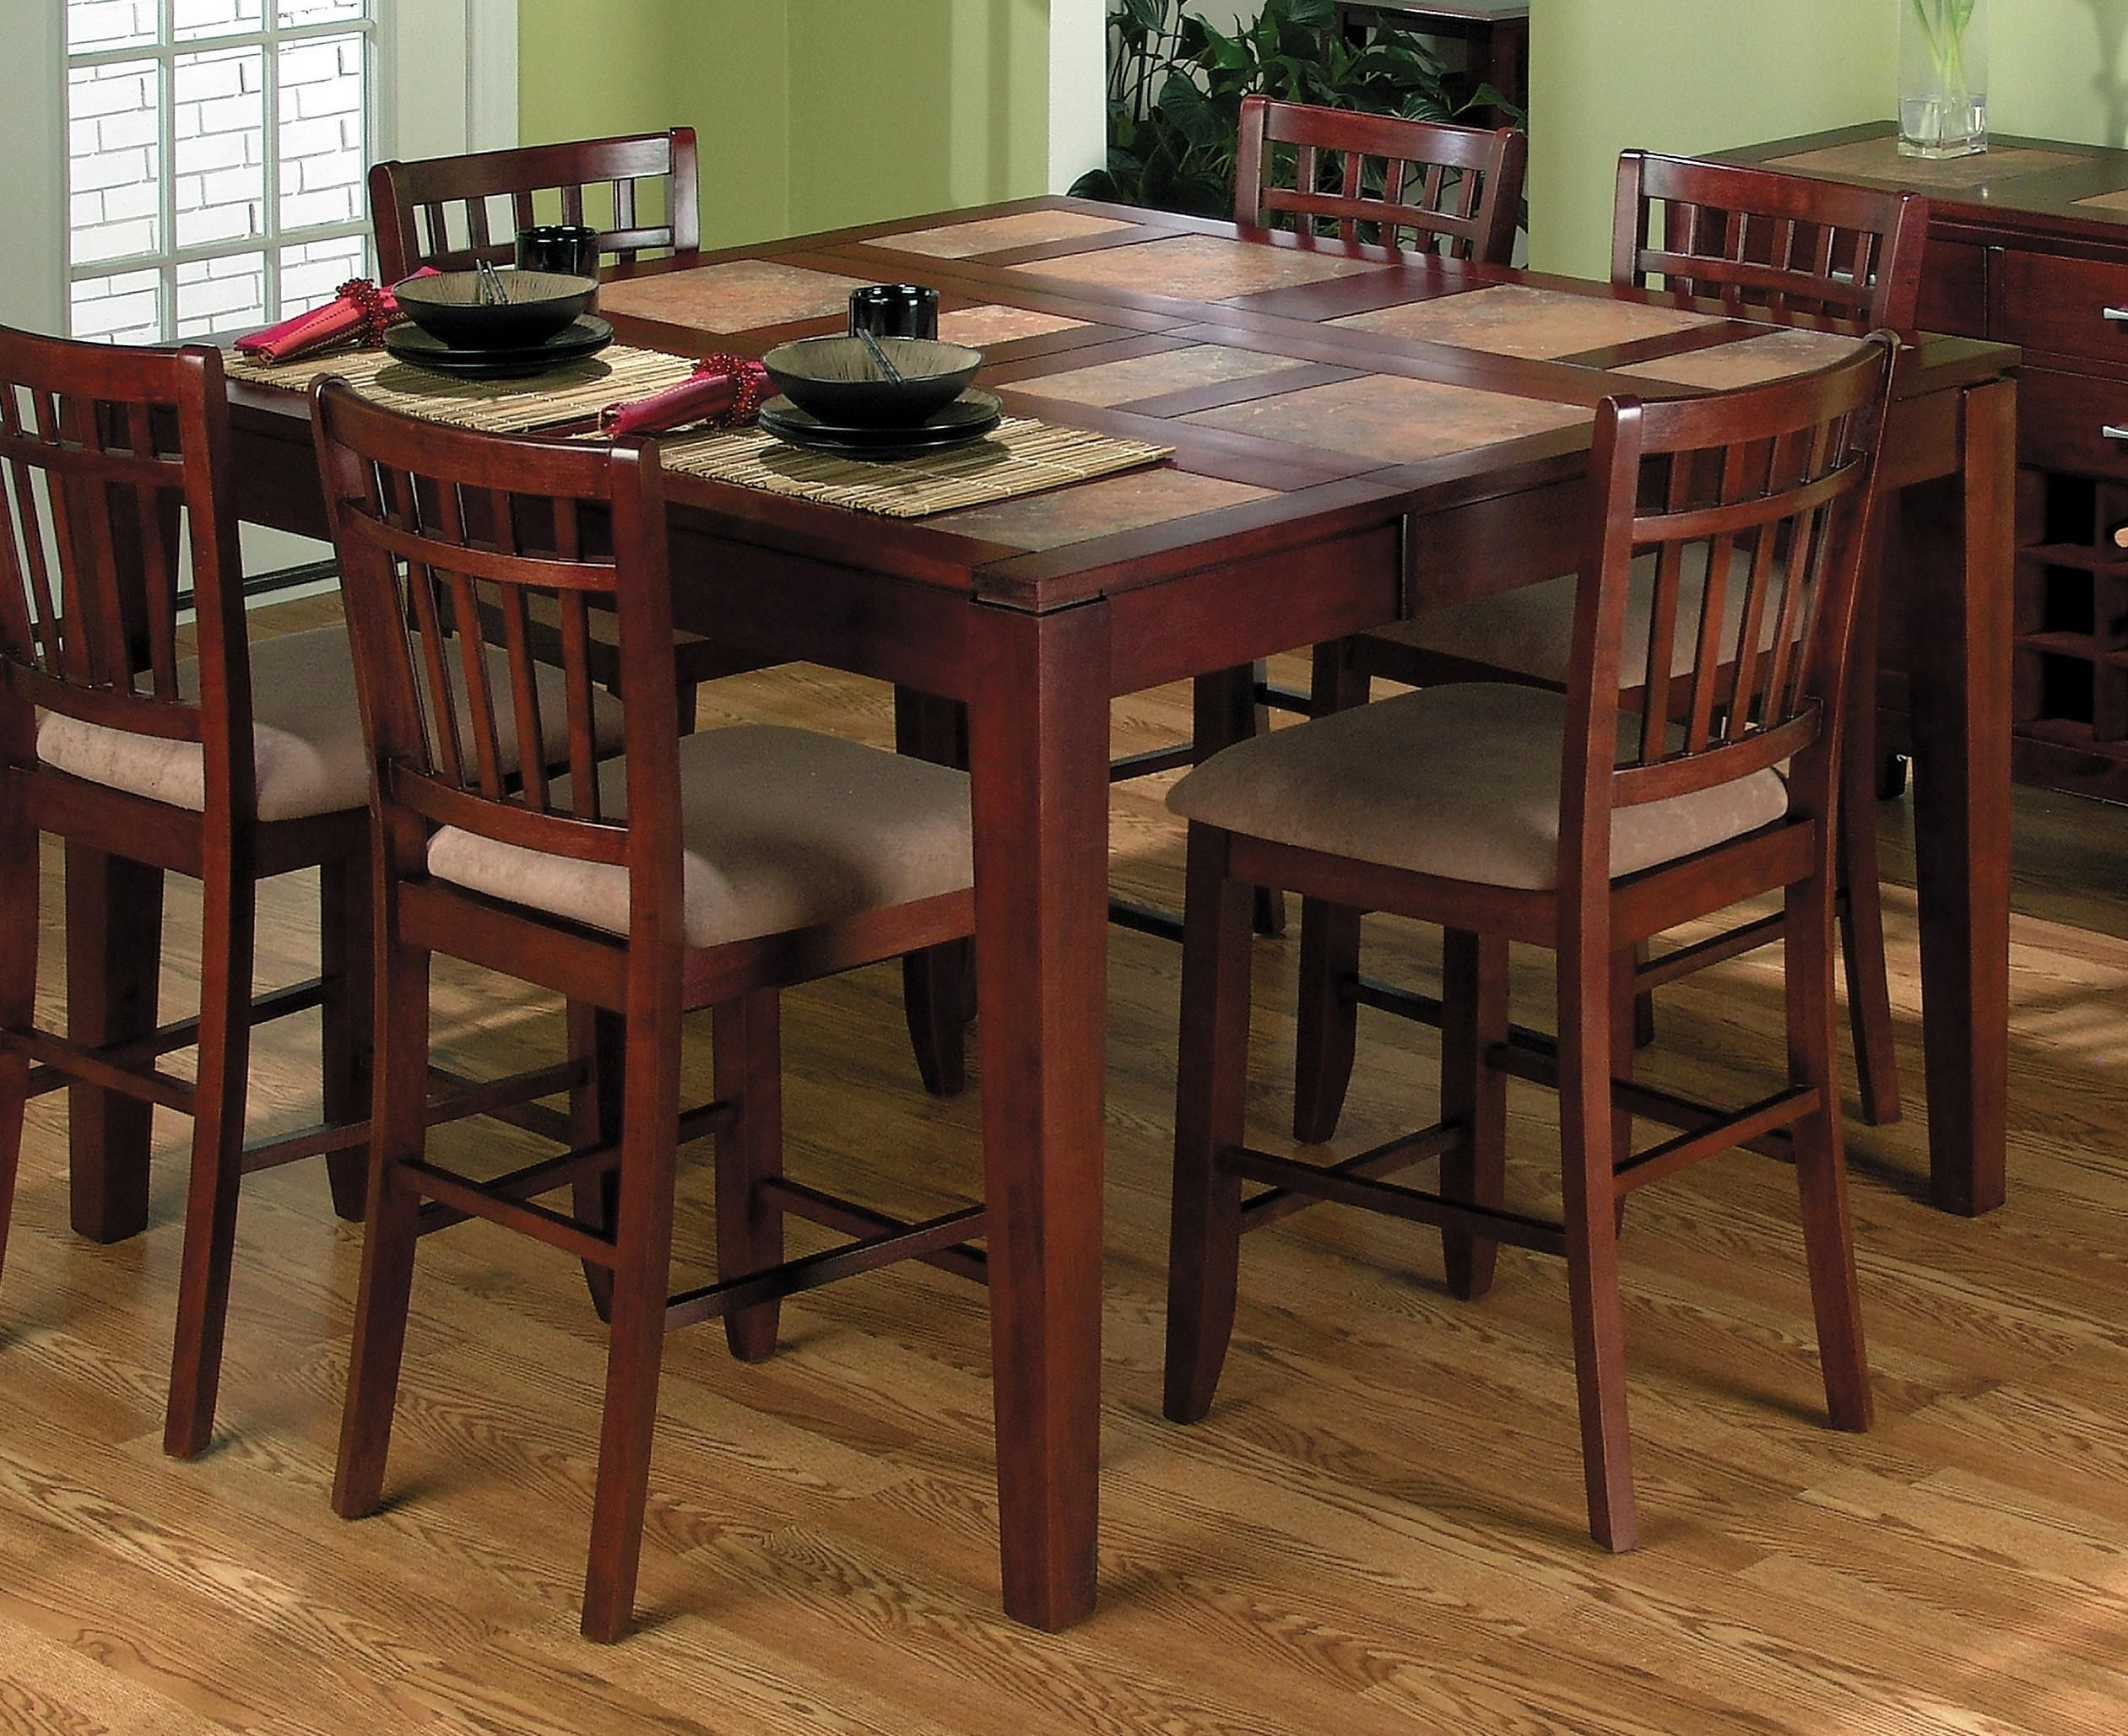 10 Small Dinette Set Design Square Kitchen Tables Counter Height Dining Table Set Kitchen Table Settings